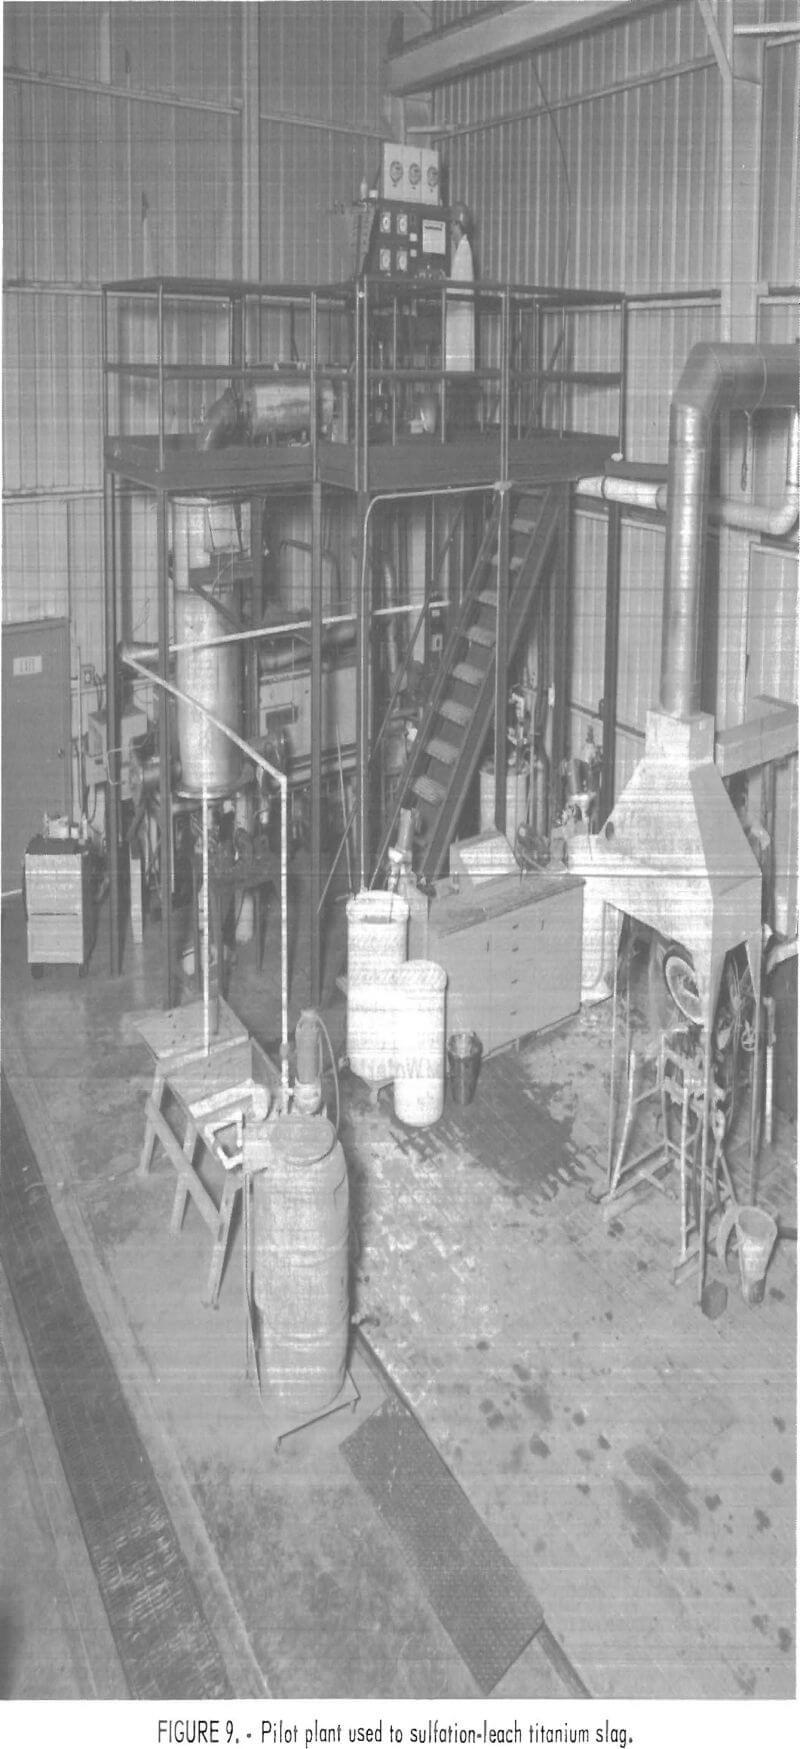 chlorination pilot plant used to sulfation-leach titanium slag